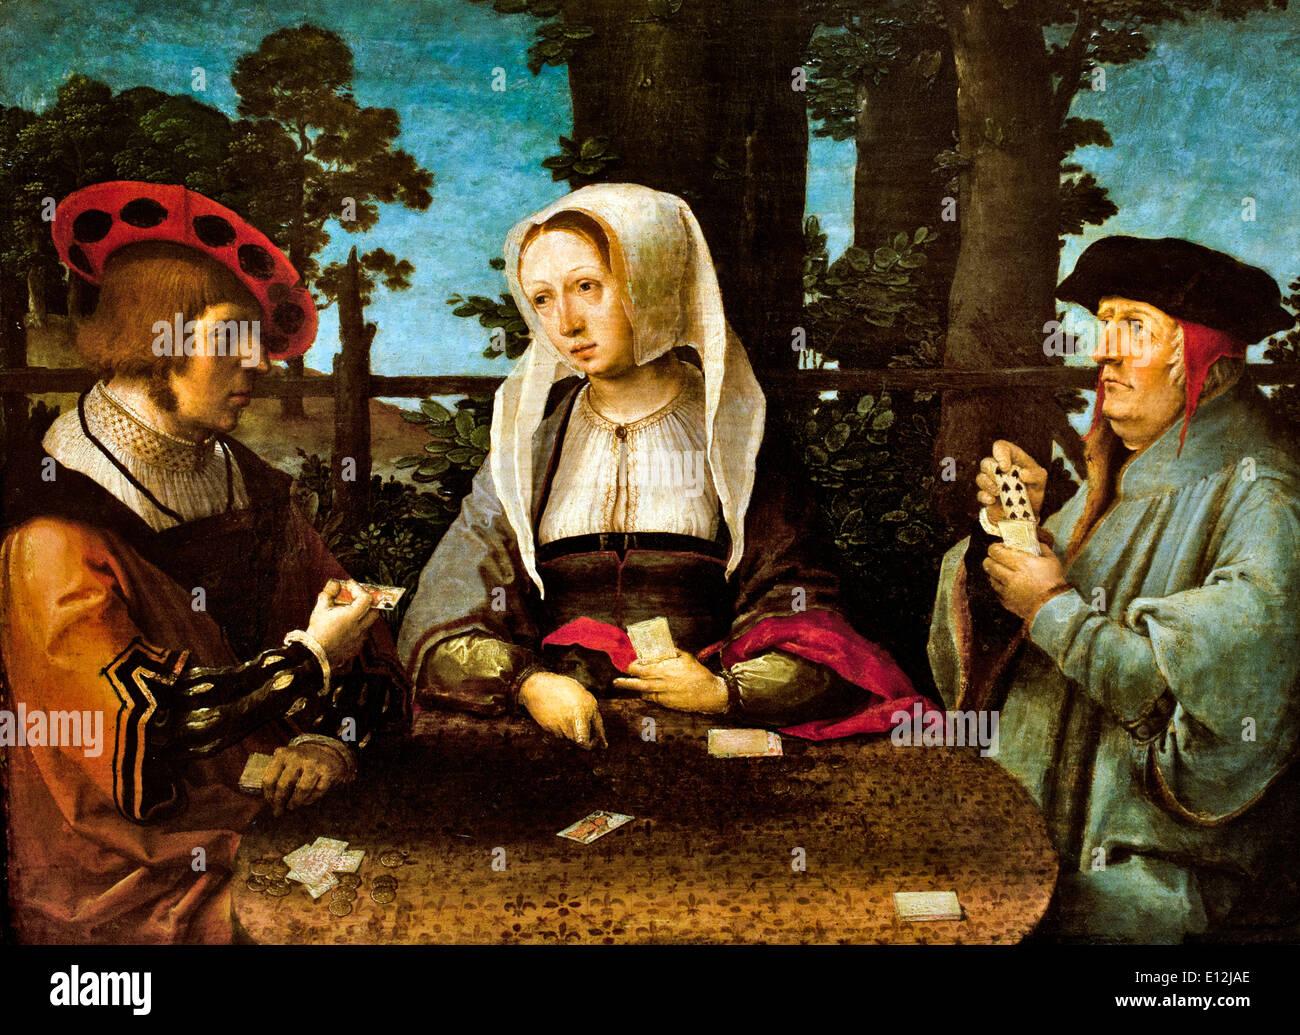 Die Karte Spieler 1520 Lucas van Leyden. Leiden1494-1533 Niederlande Niederlande Stockbild